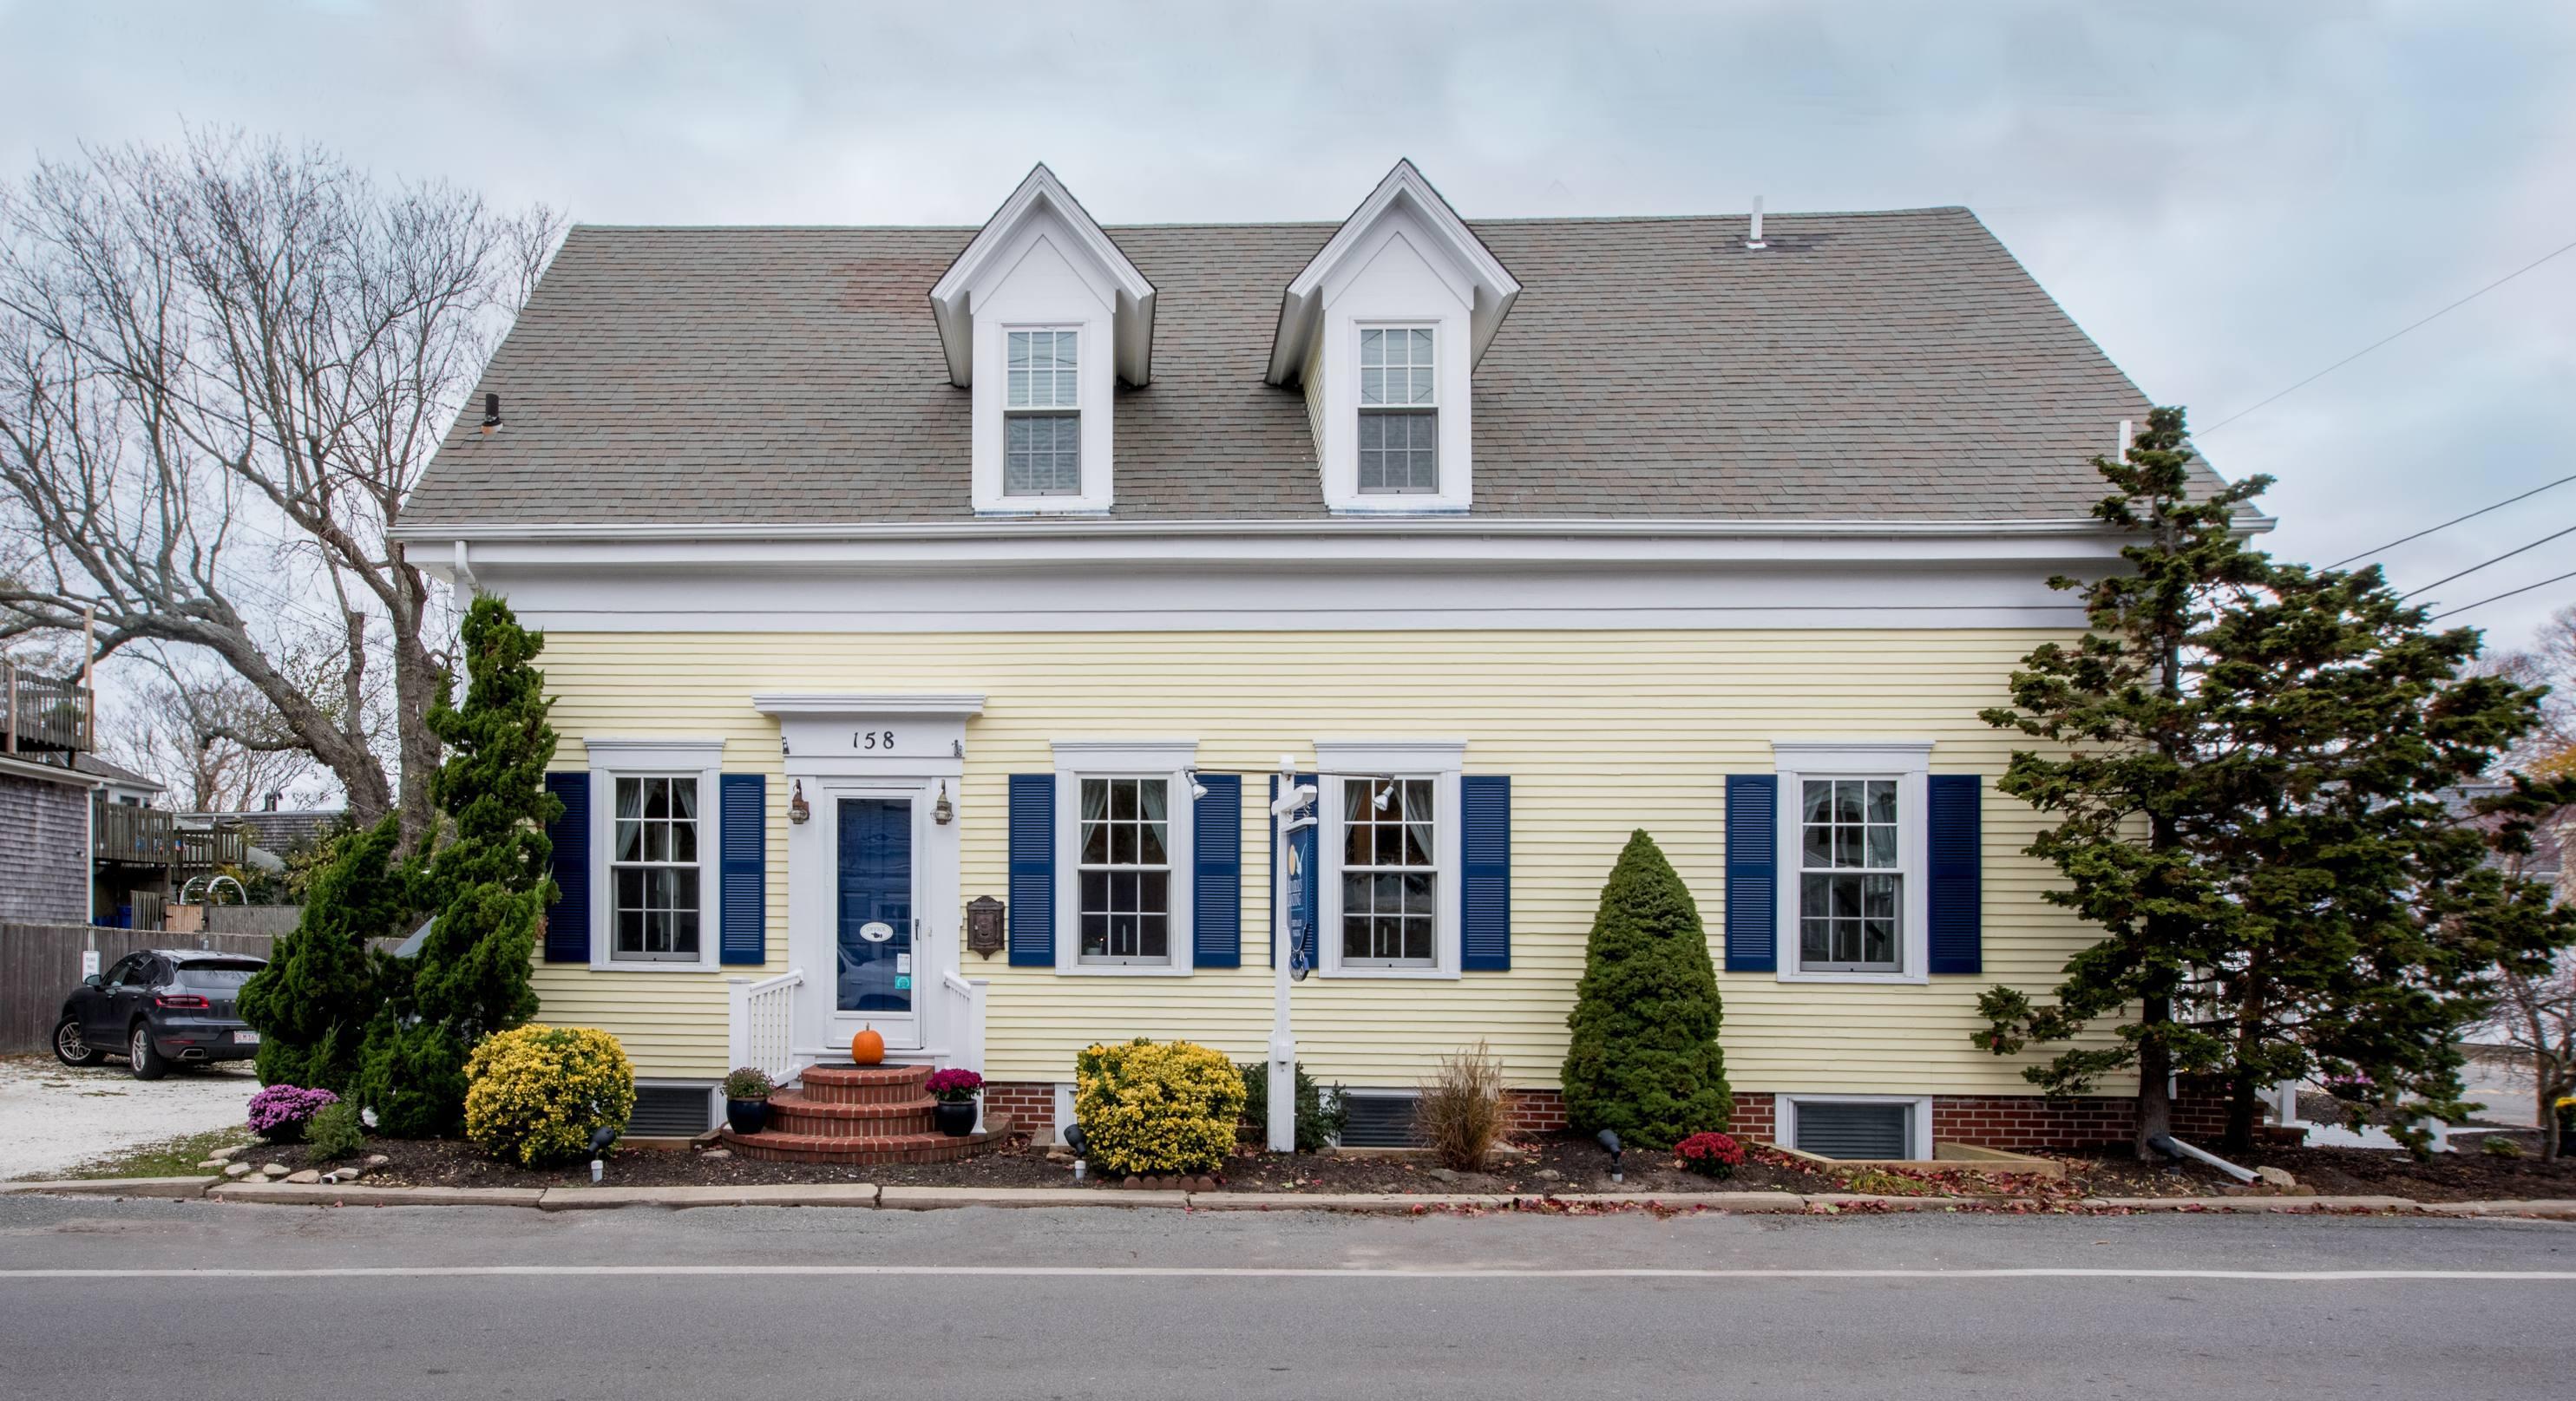 158 Bradford Street, Provincetown MA, 02657 details